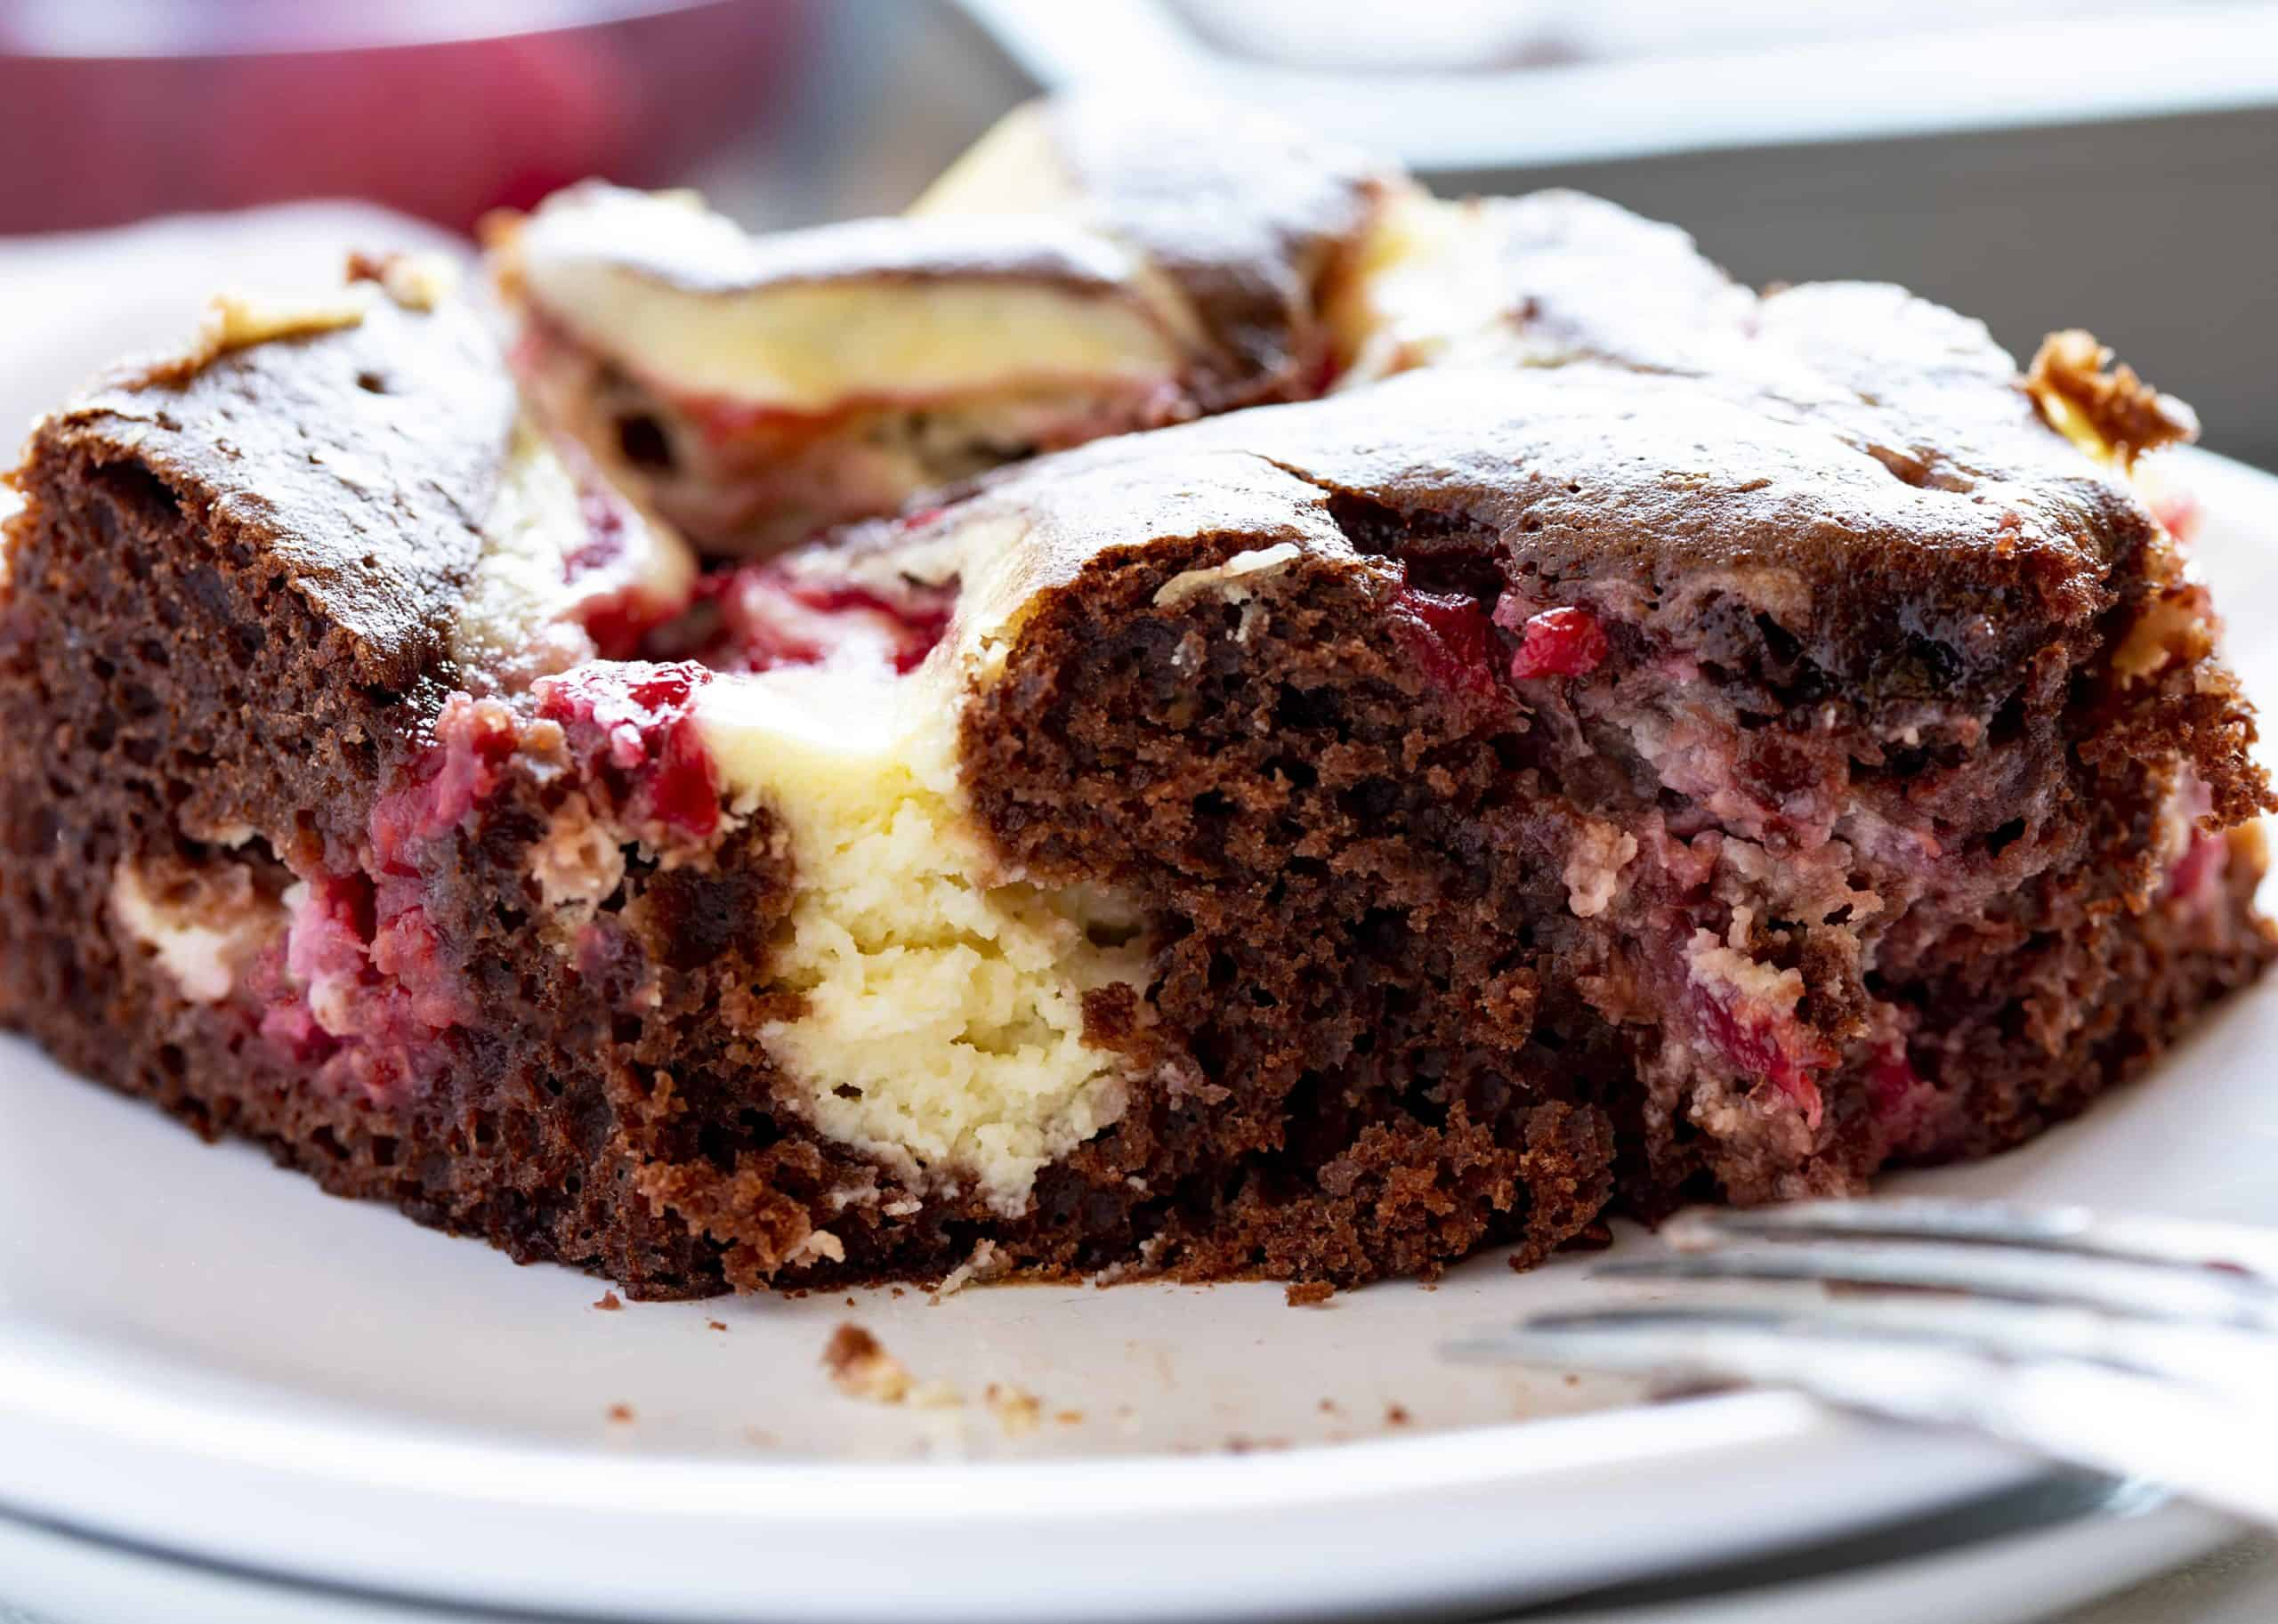 Cheesecake Chocolate Sheetcake